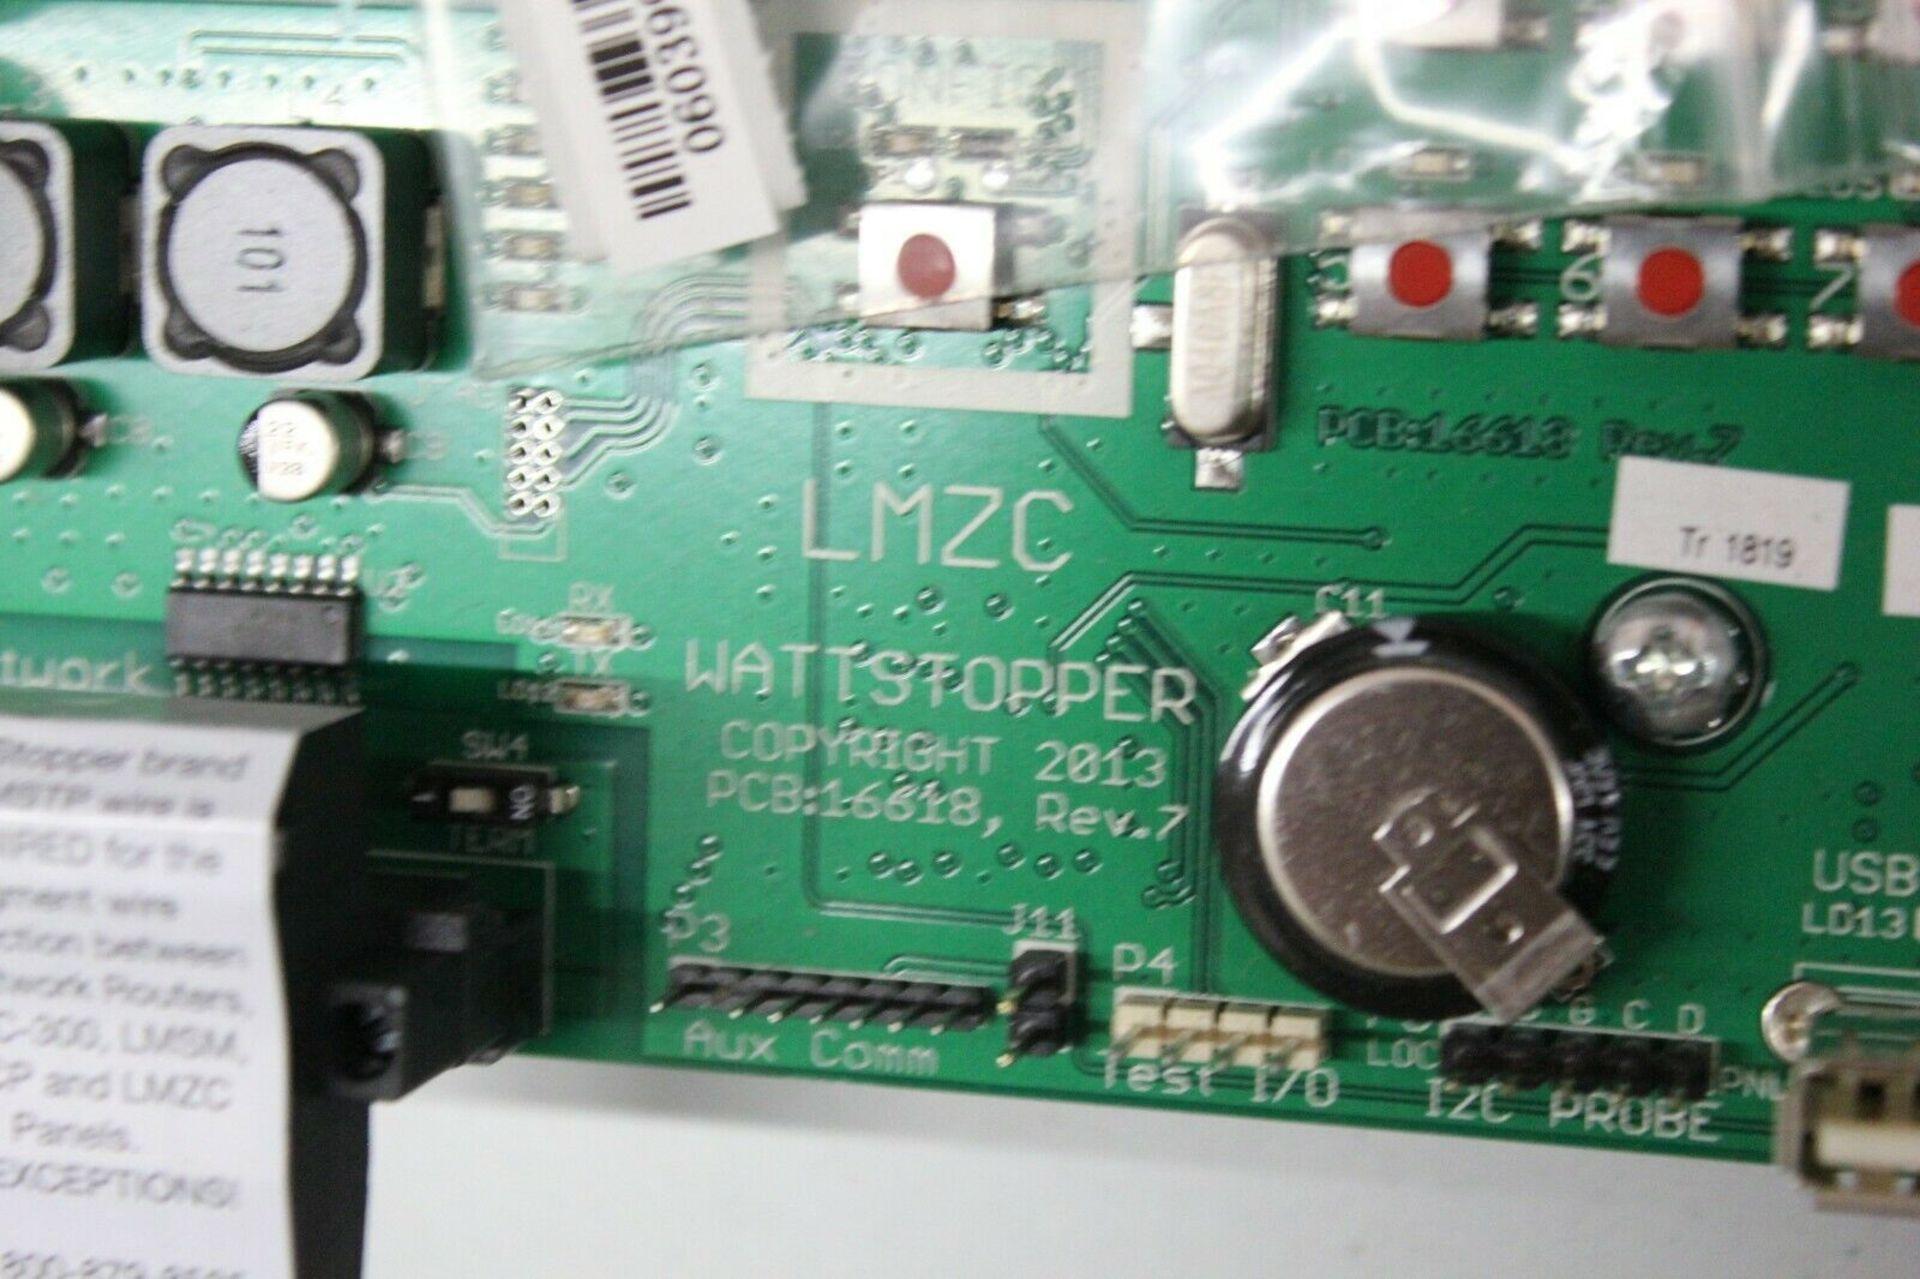 UNUSED WATTSTOPPER DLM ZONE CONTROLLER, SCHEDULER & NETWORK INTERFACE - Image 5 of 6